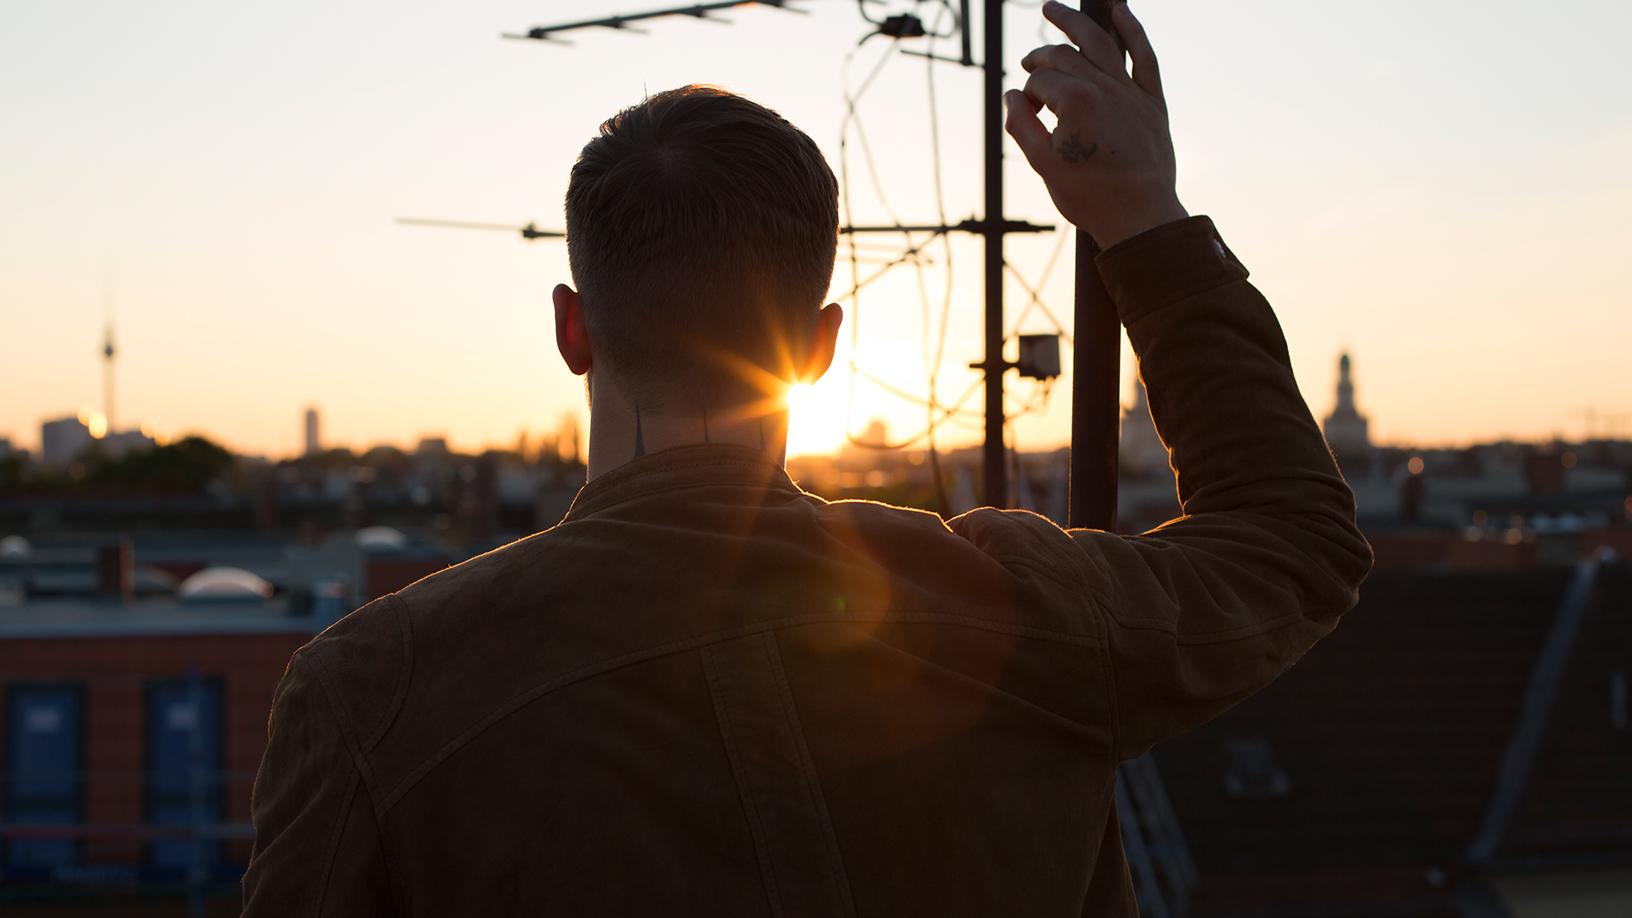 street shooting, photography, berlin, instinkte, streetlife, urban,